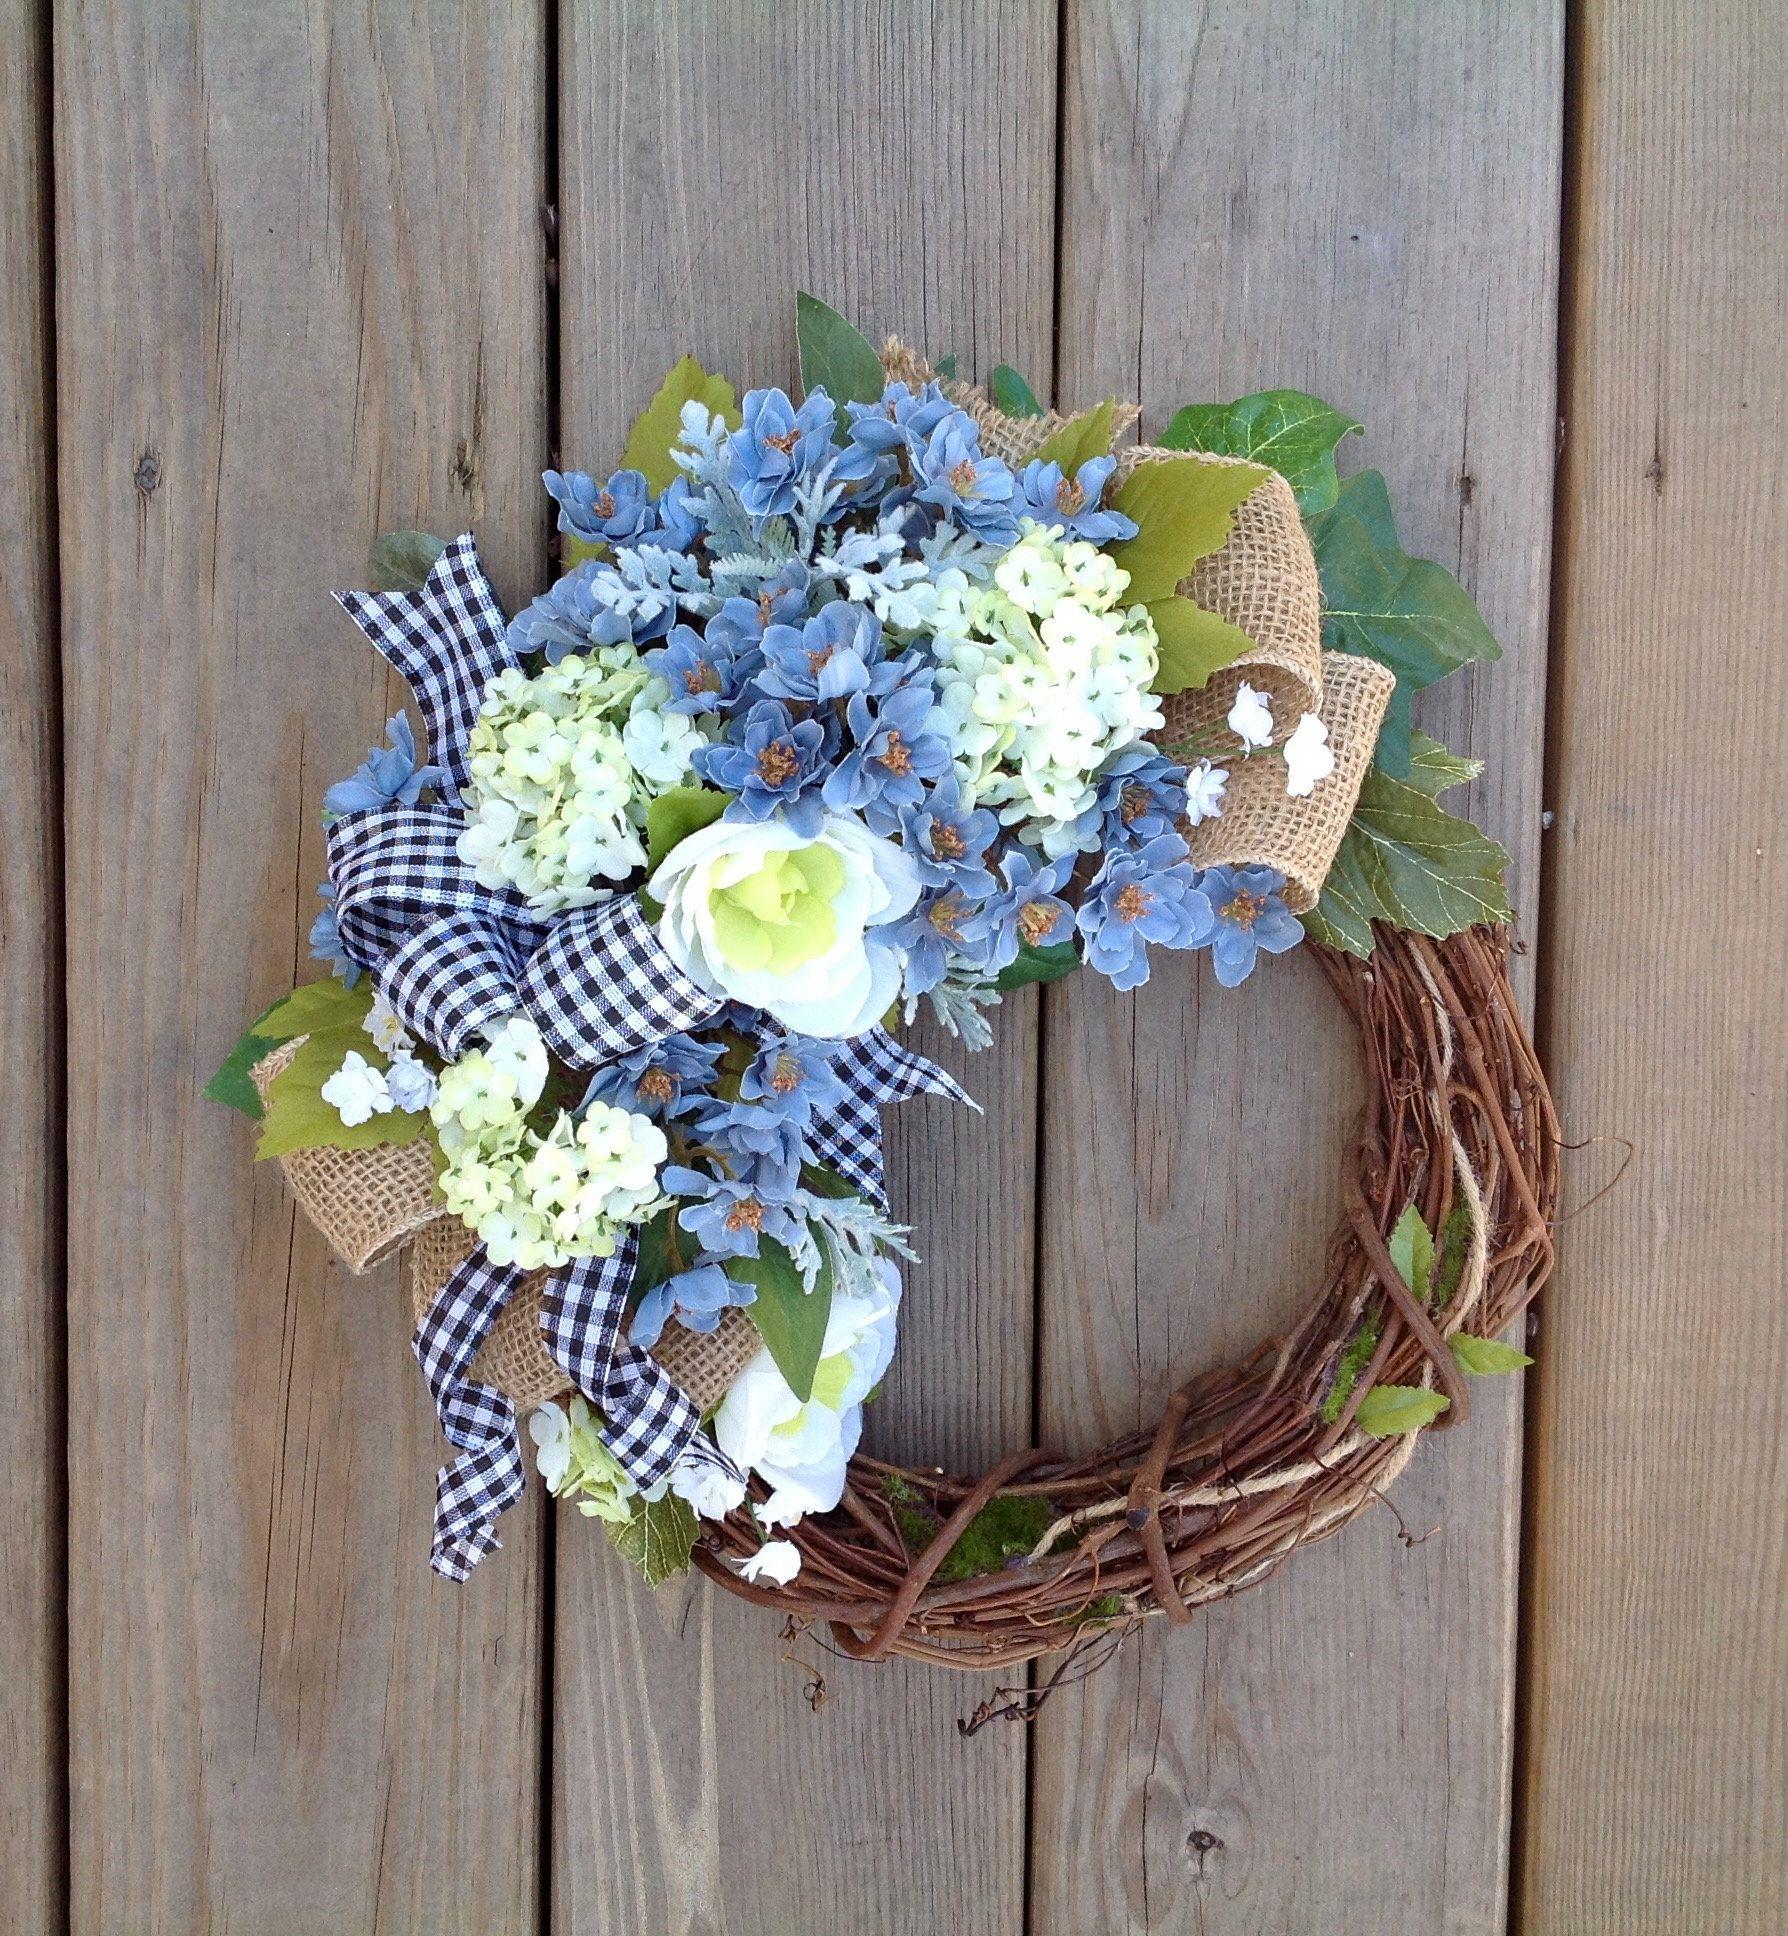 Everyday wreath, year round wreath, blue wreath, small